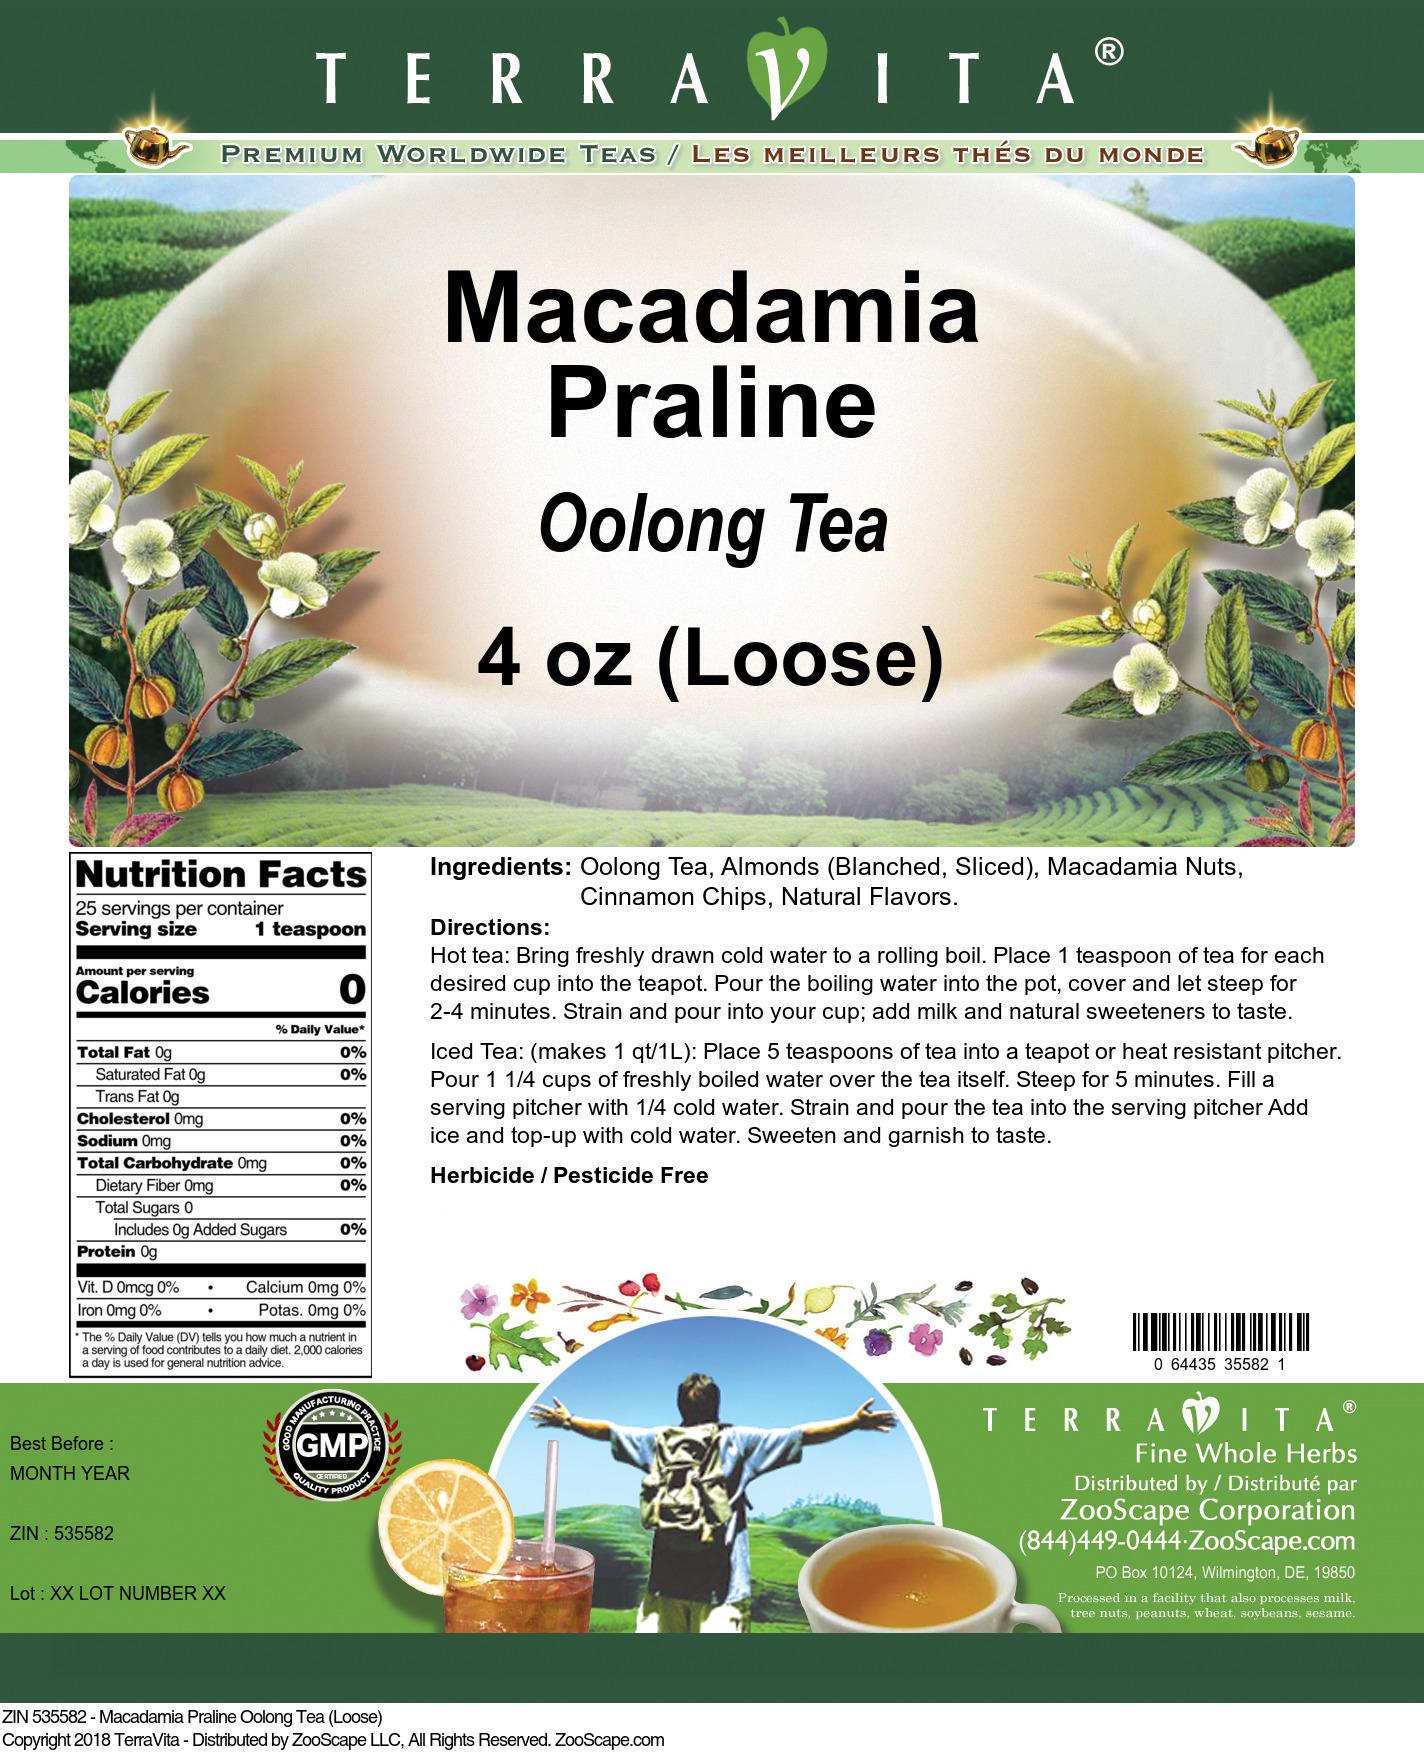 Macadamia Praline Oolong Tea (Loose)